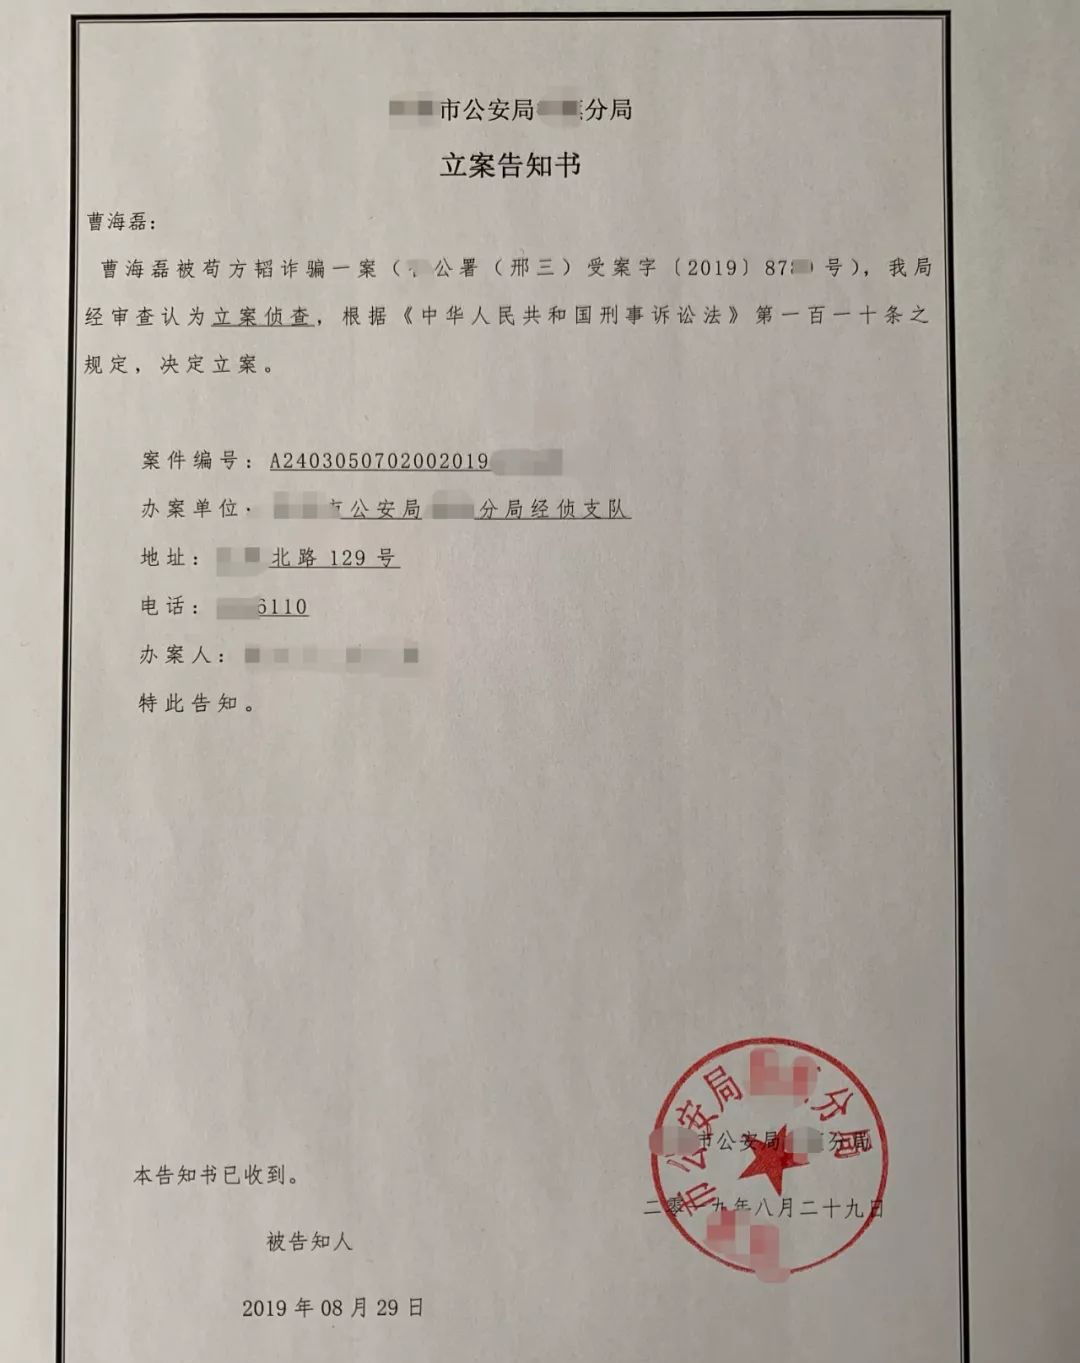 Gateio首发IEO项目嘀哩嘀哩(DiLi)涉嫌诈骗,已被立案侦查